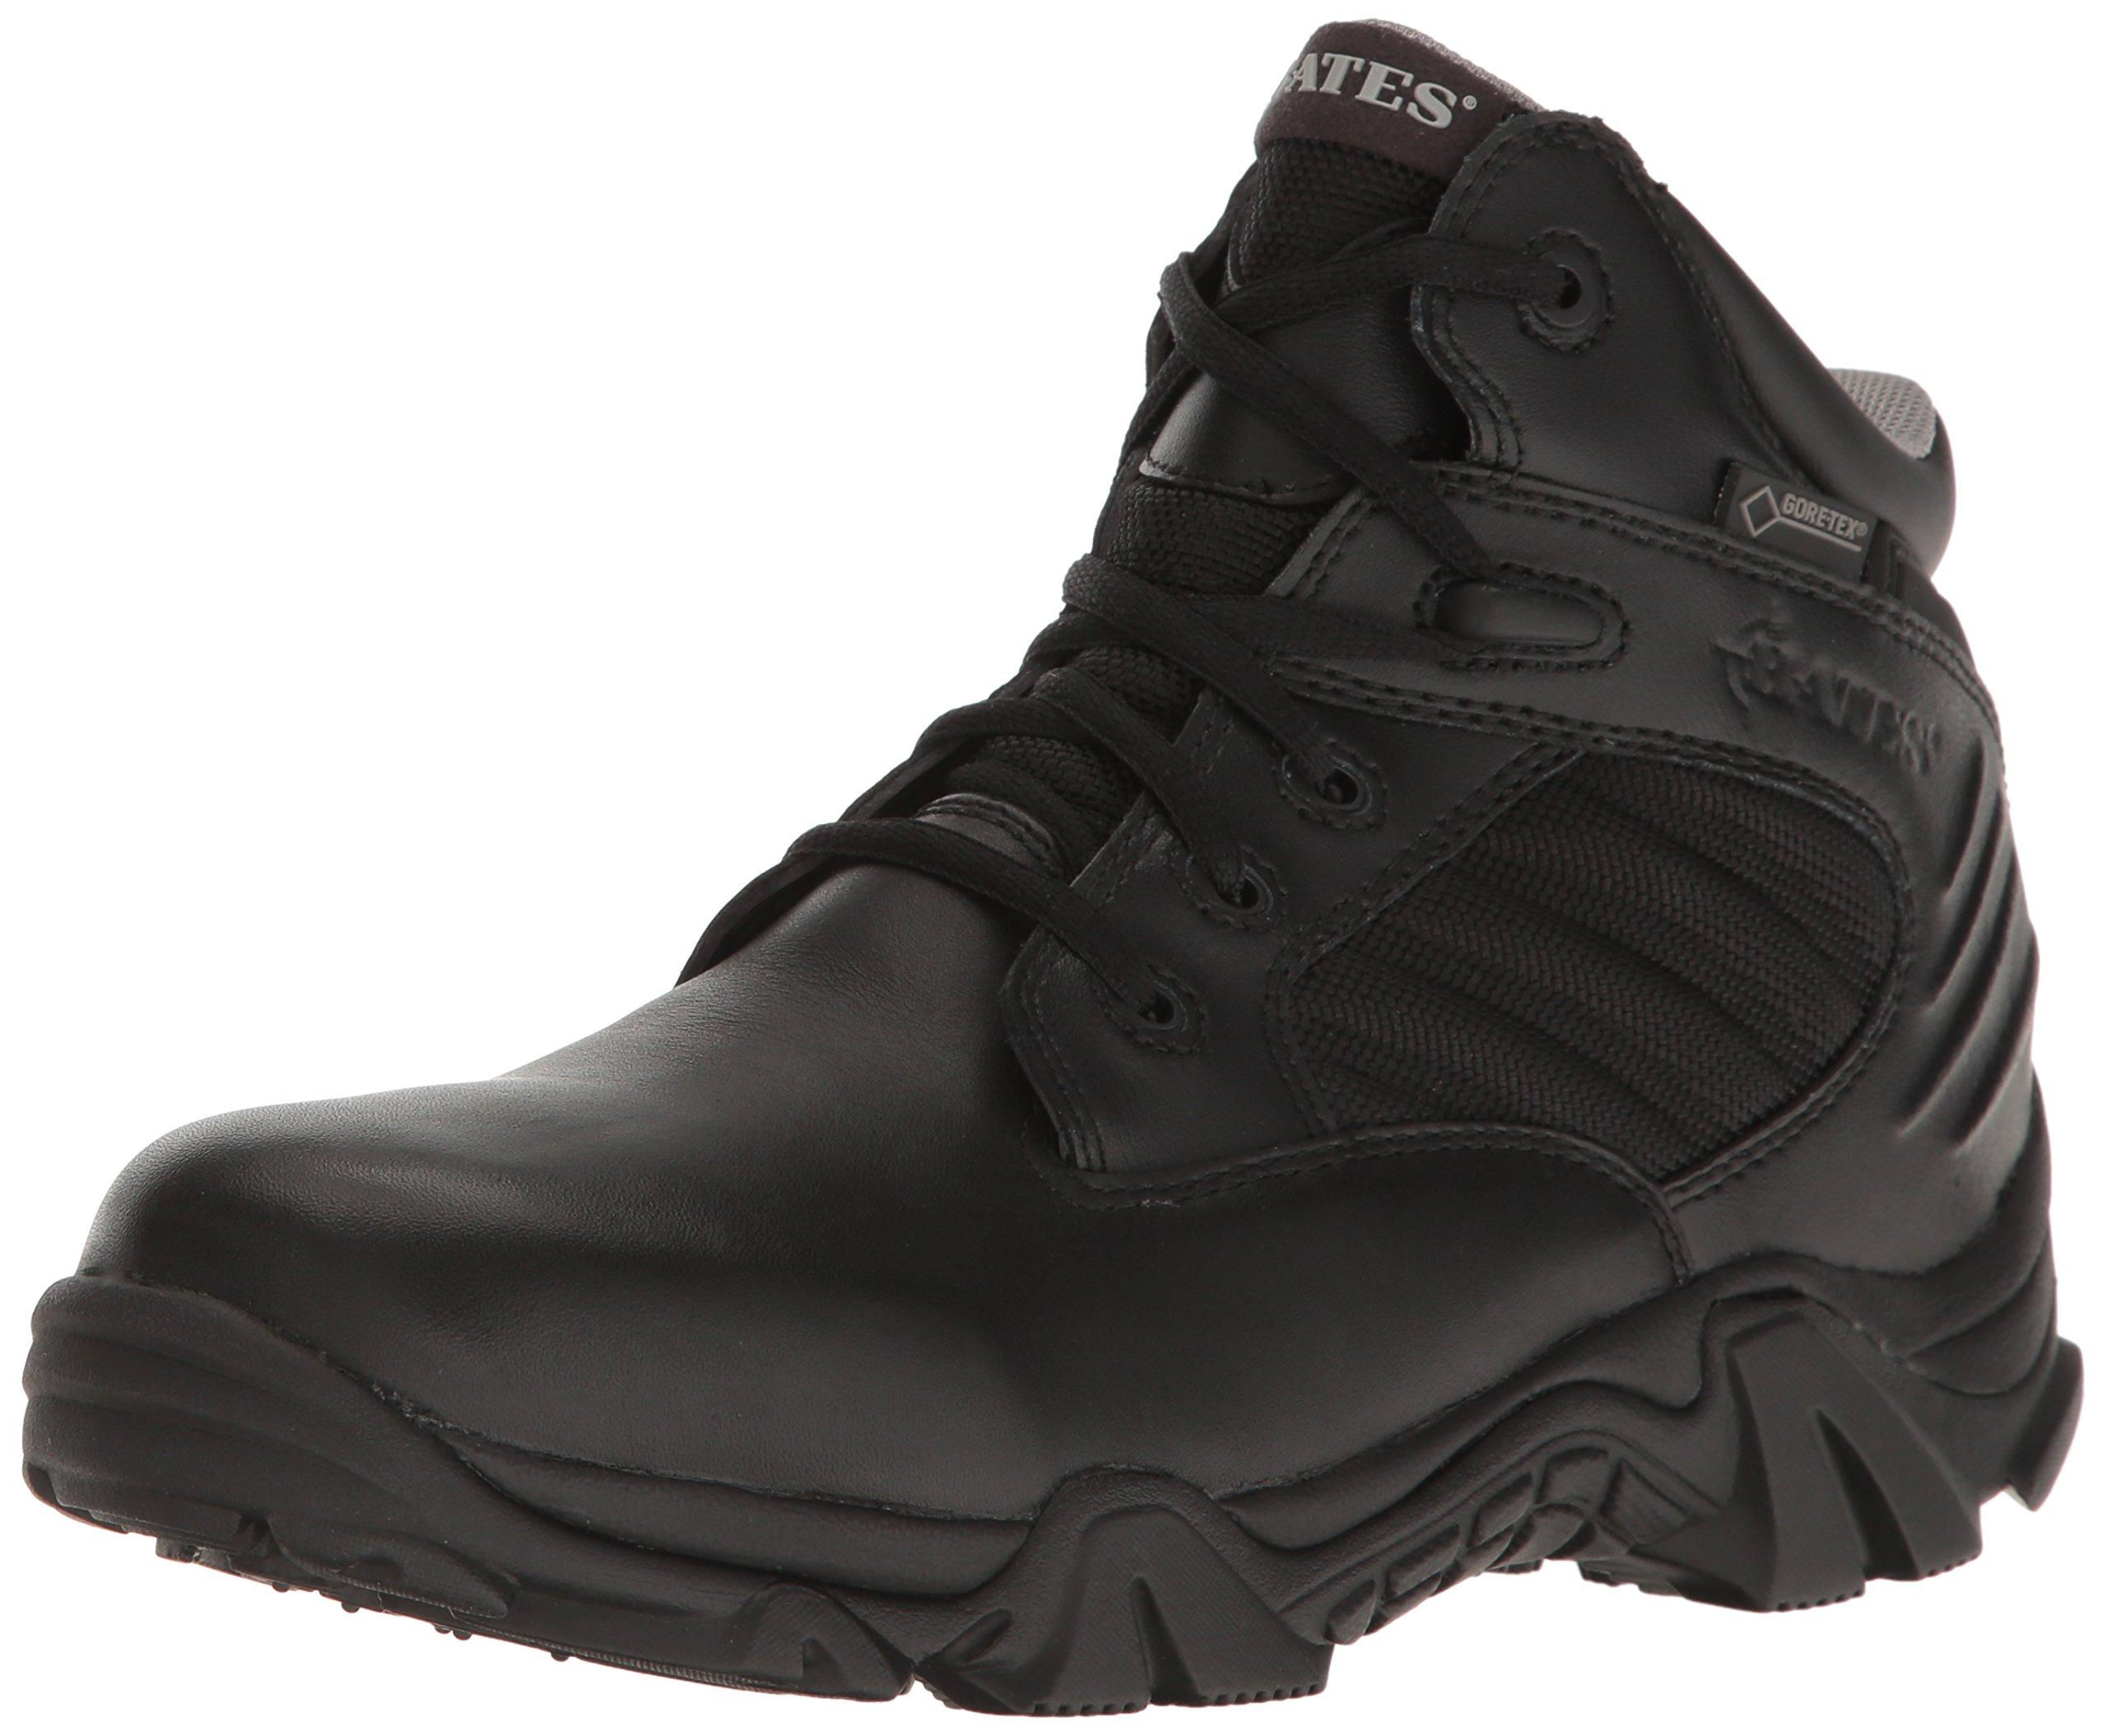 Bates Women's Gx-4 4 Inch Boot, Black, 7.5 M US